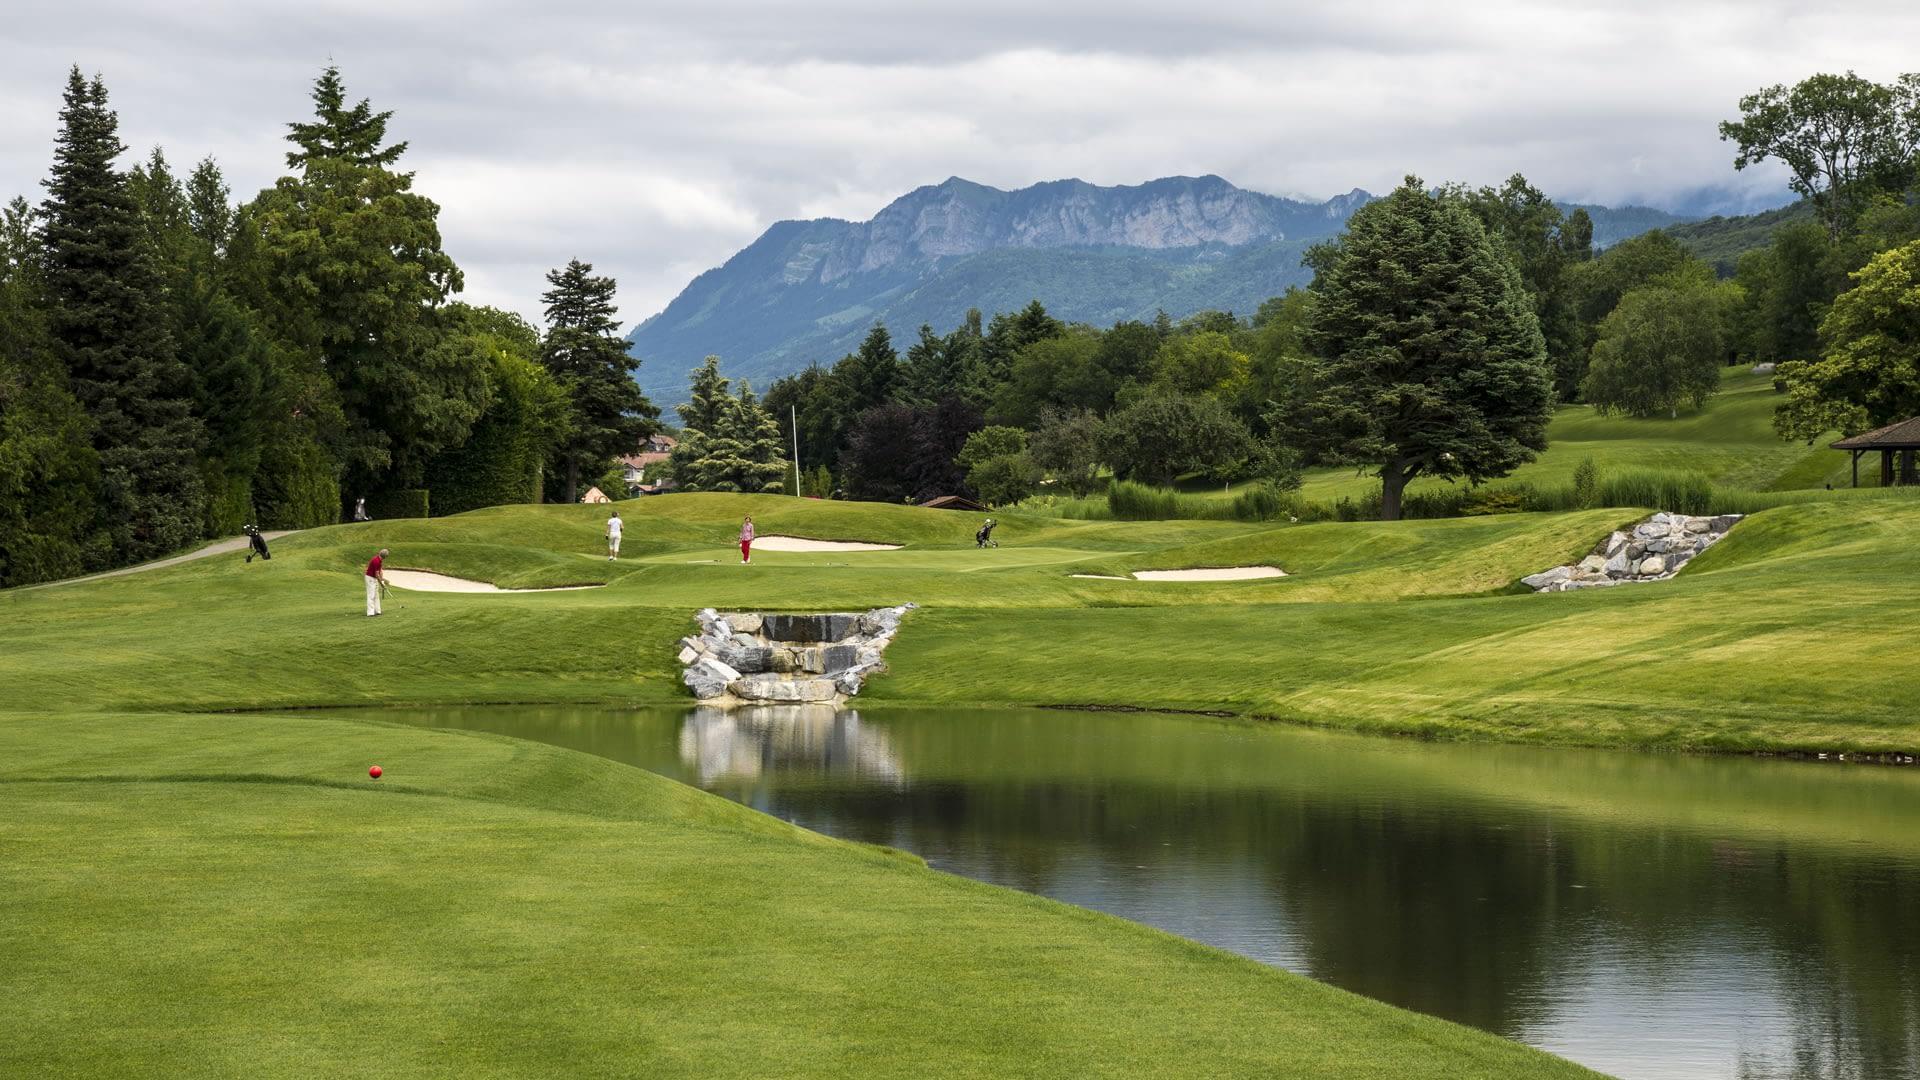 The Evian Resort golf